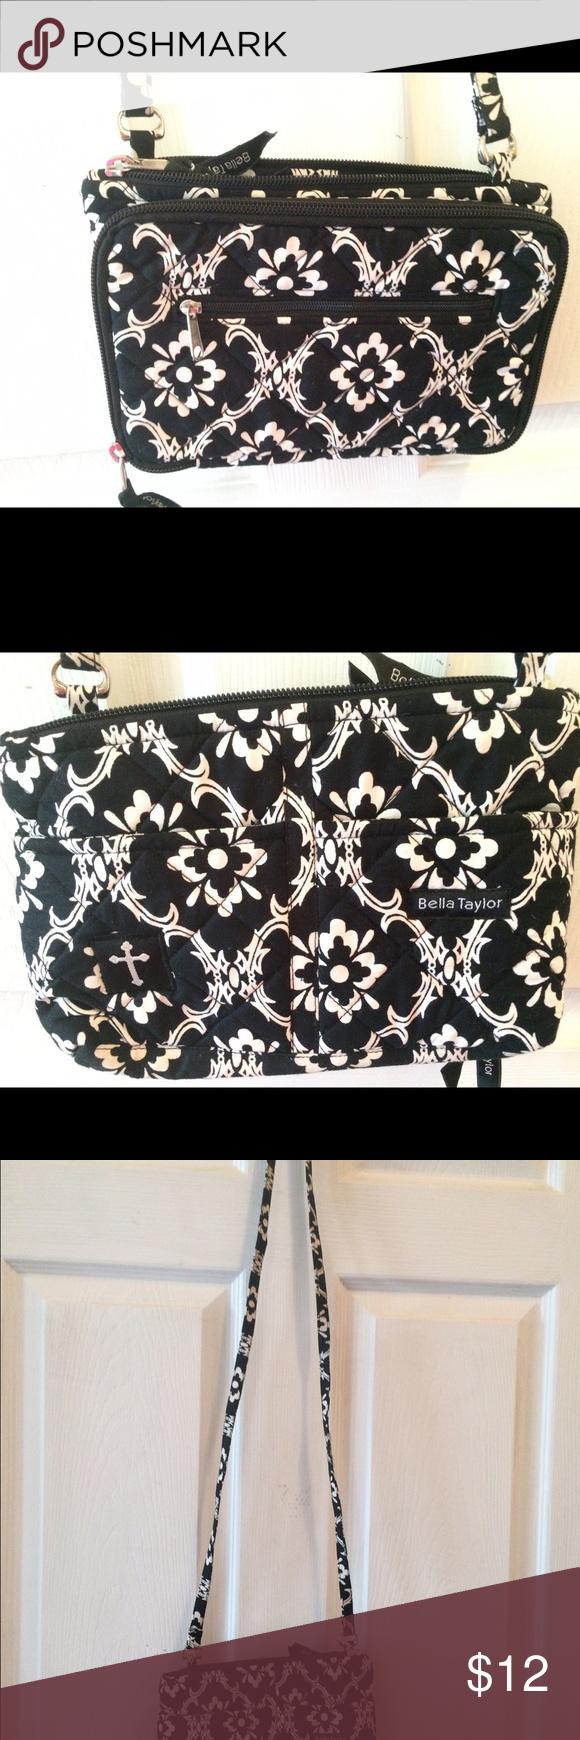 Crossbody quilted purse Crossbody quilted purse Bags Crossbody Bags